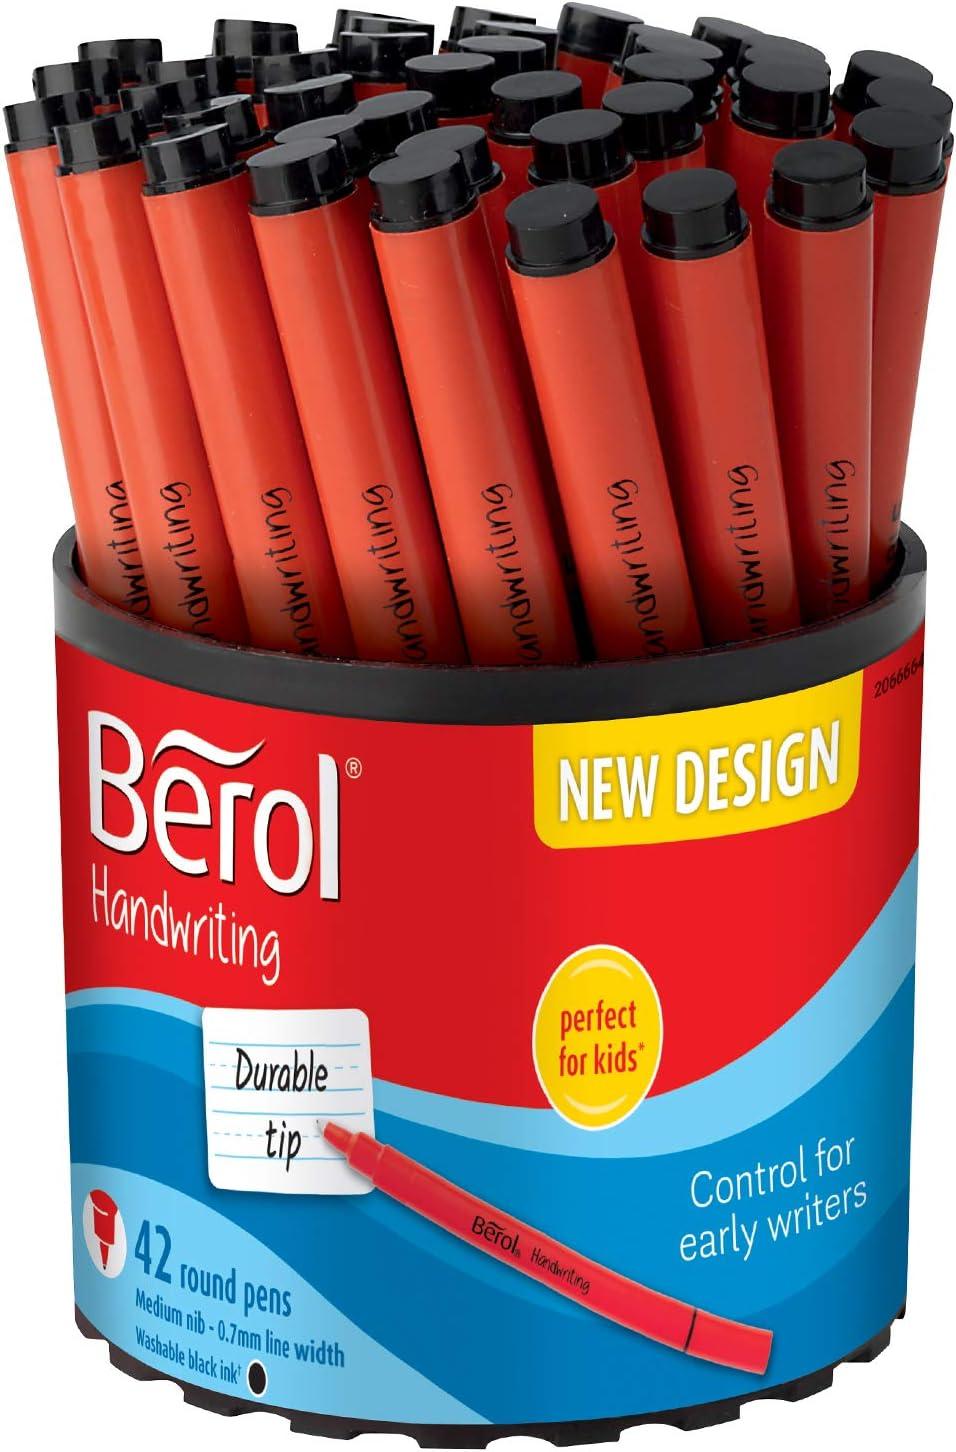 8 x Berol Handwriting Pens Blue or Black or Mix